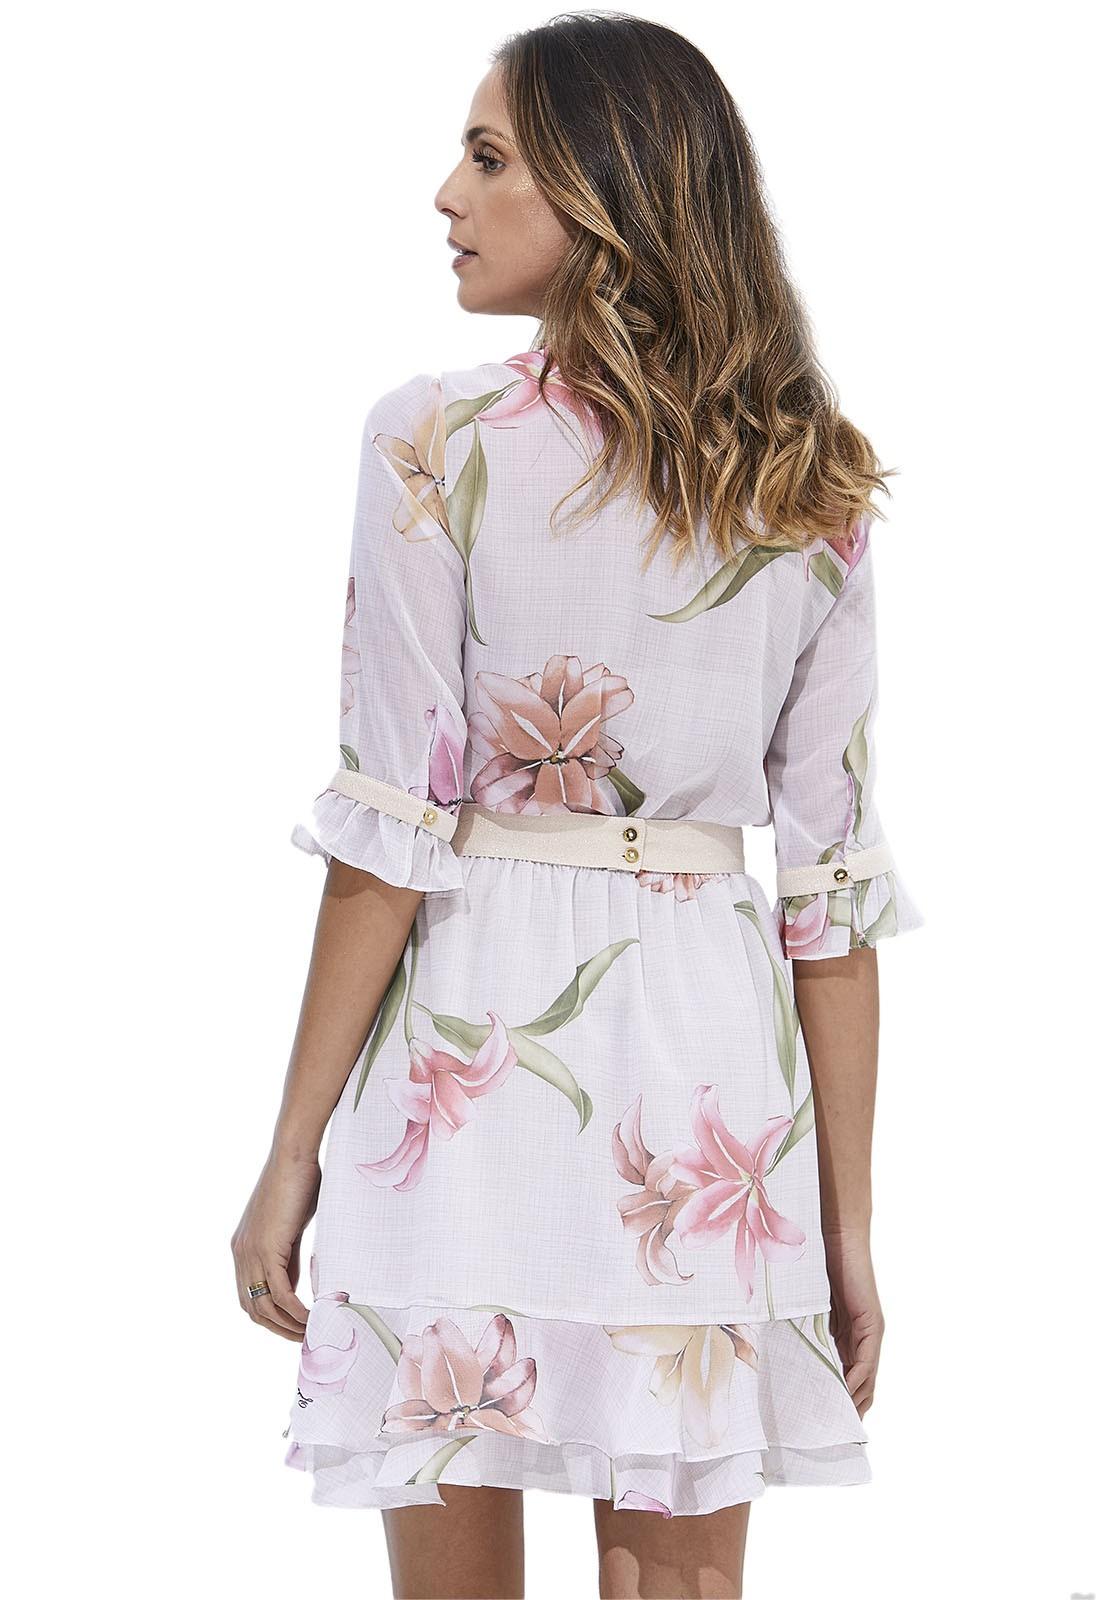 Chemise Vestido Zaiko Estampado Floral 3/4 2168